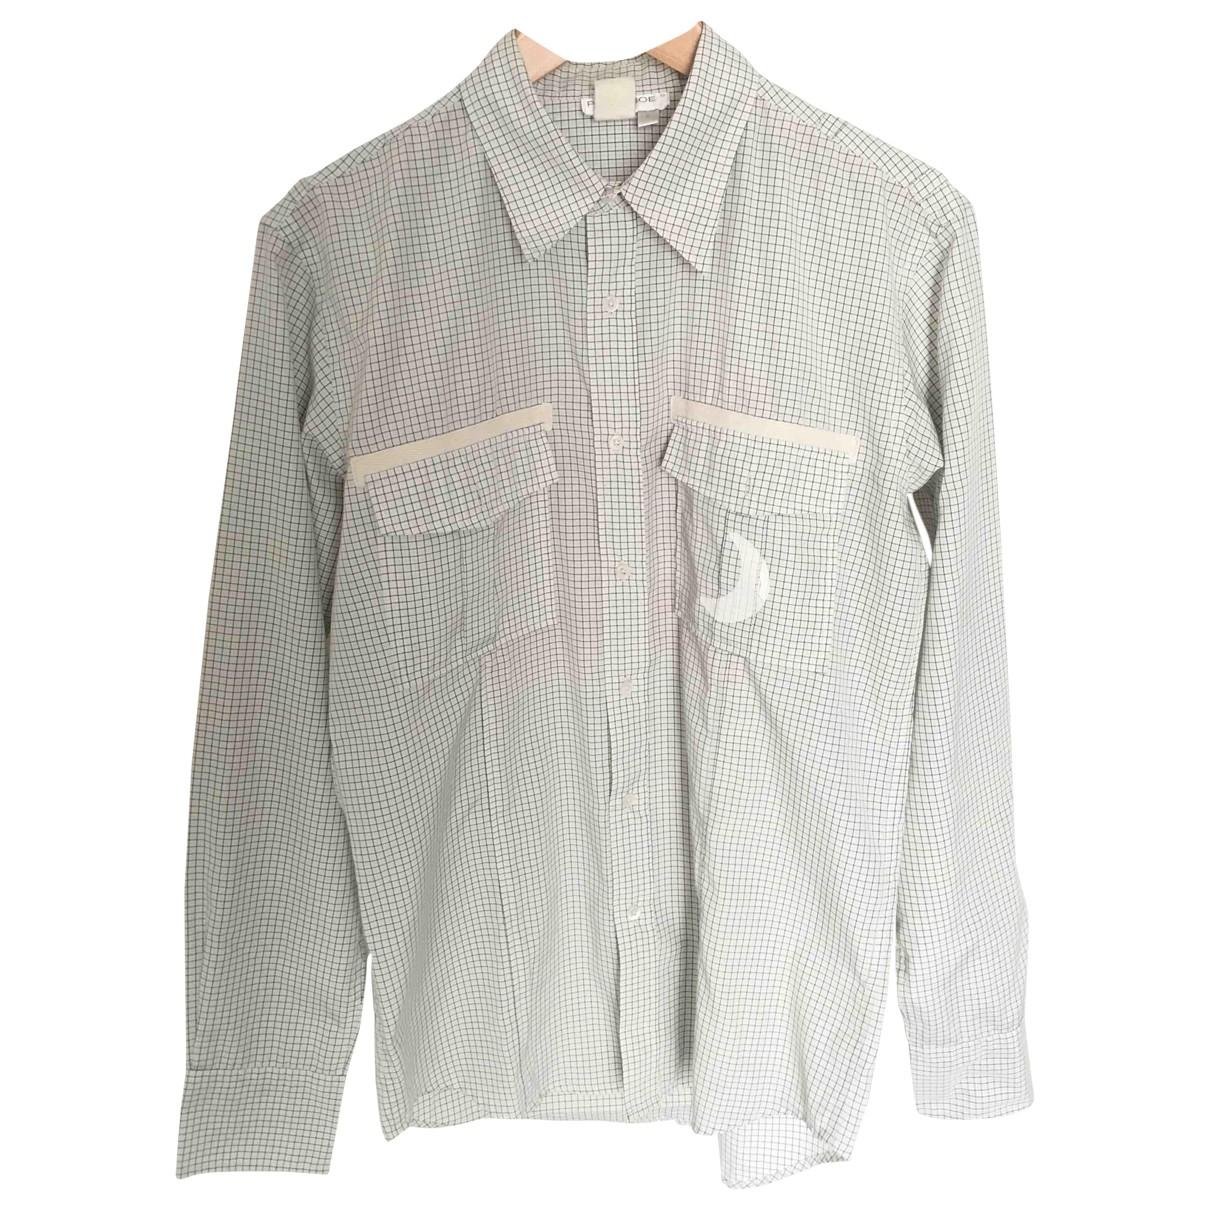 Paul & Joe \N Cotton Shirts for Men S International